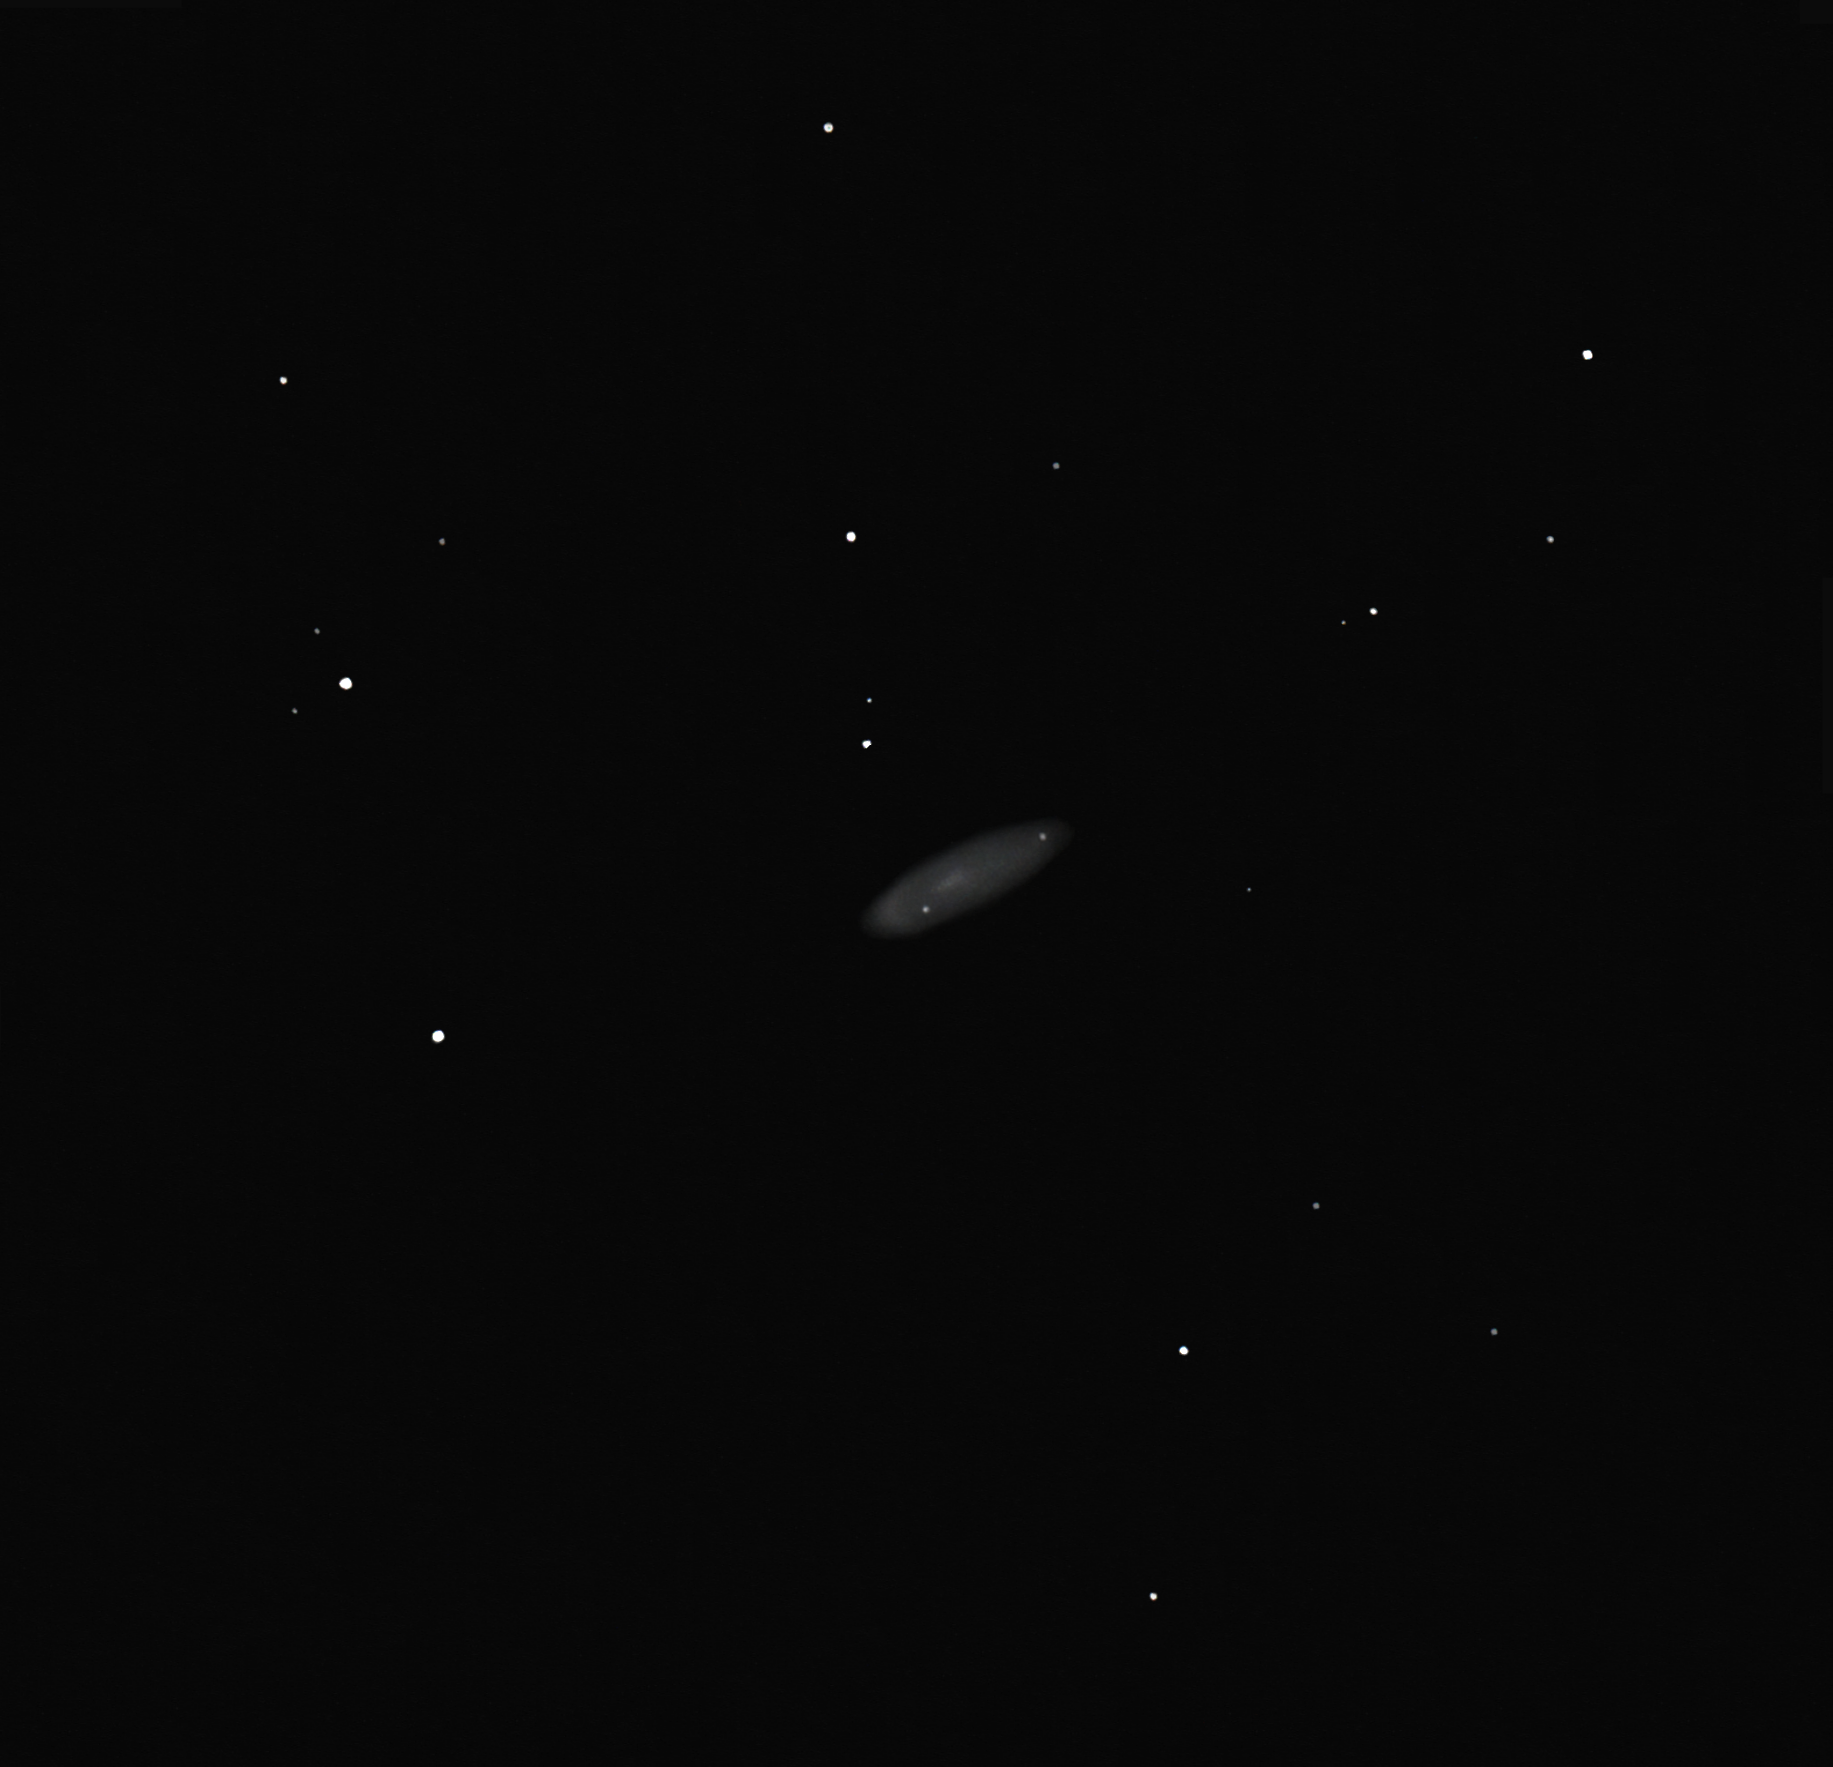 ngc 1792 galaxy